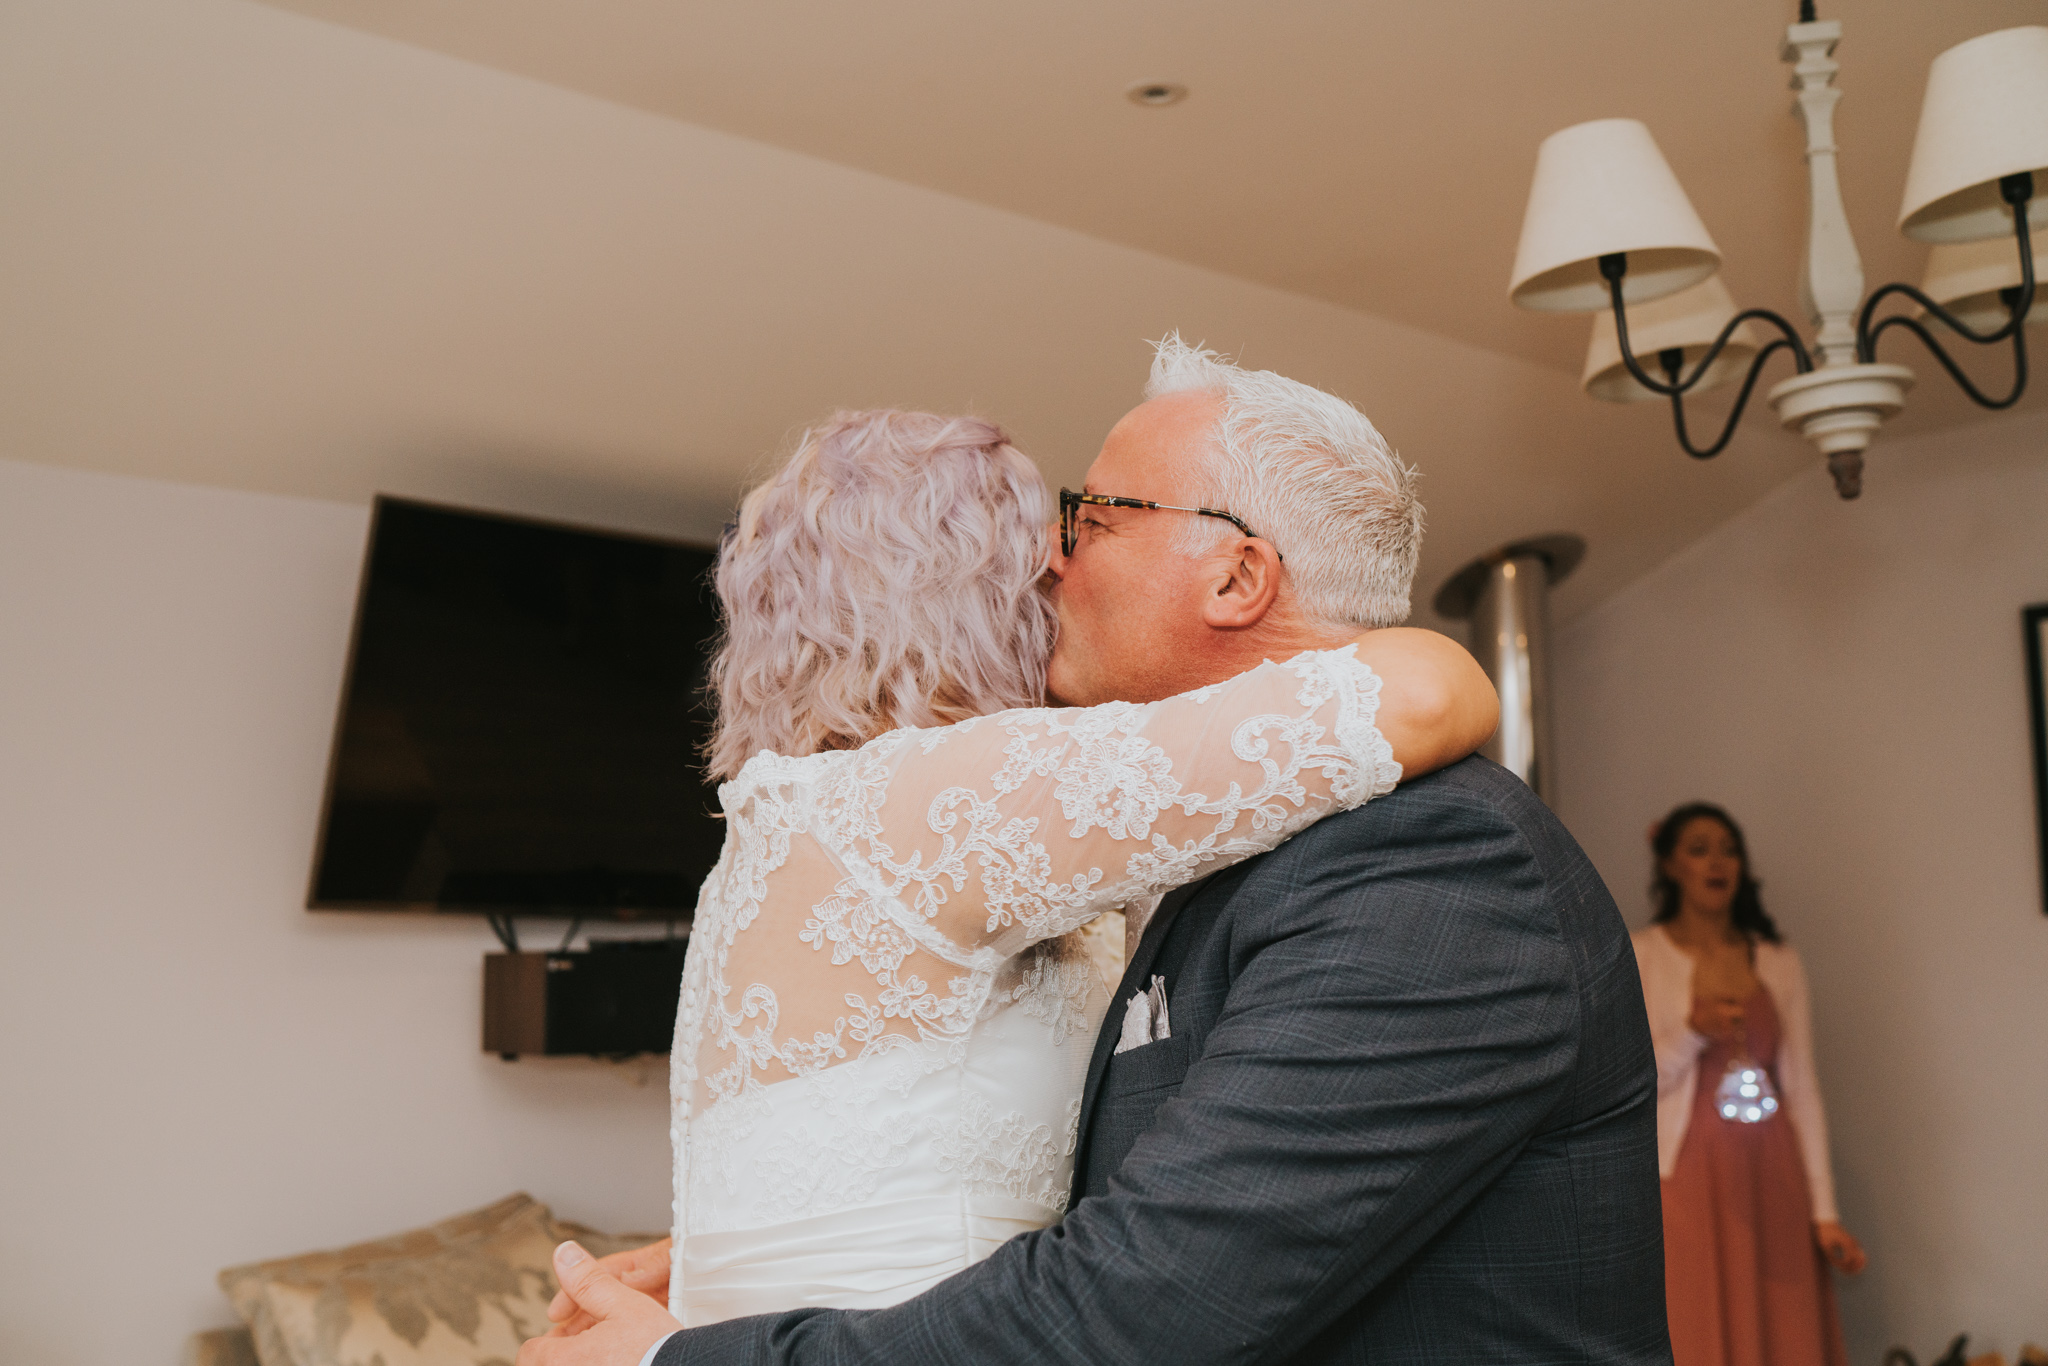 rhia-james-rustic-crabbs-barn-vintage-50s-retro-wedding-grace-elizabeth-colchester-essex-alternative-relaxed-wedding-family-photography-devon-suffolk-norfolk-essex (46 of 138).jpg